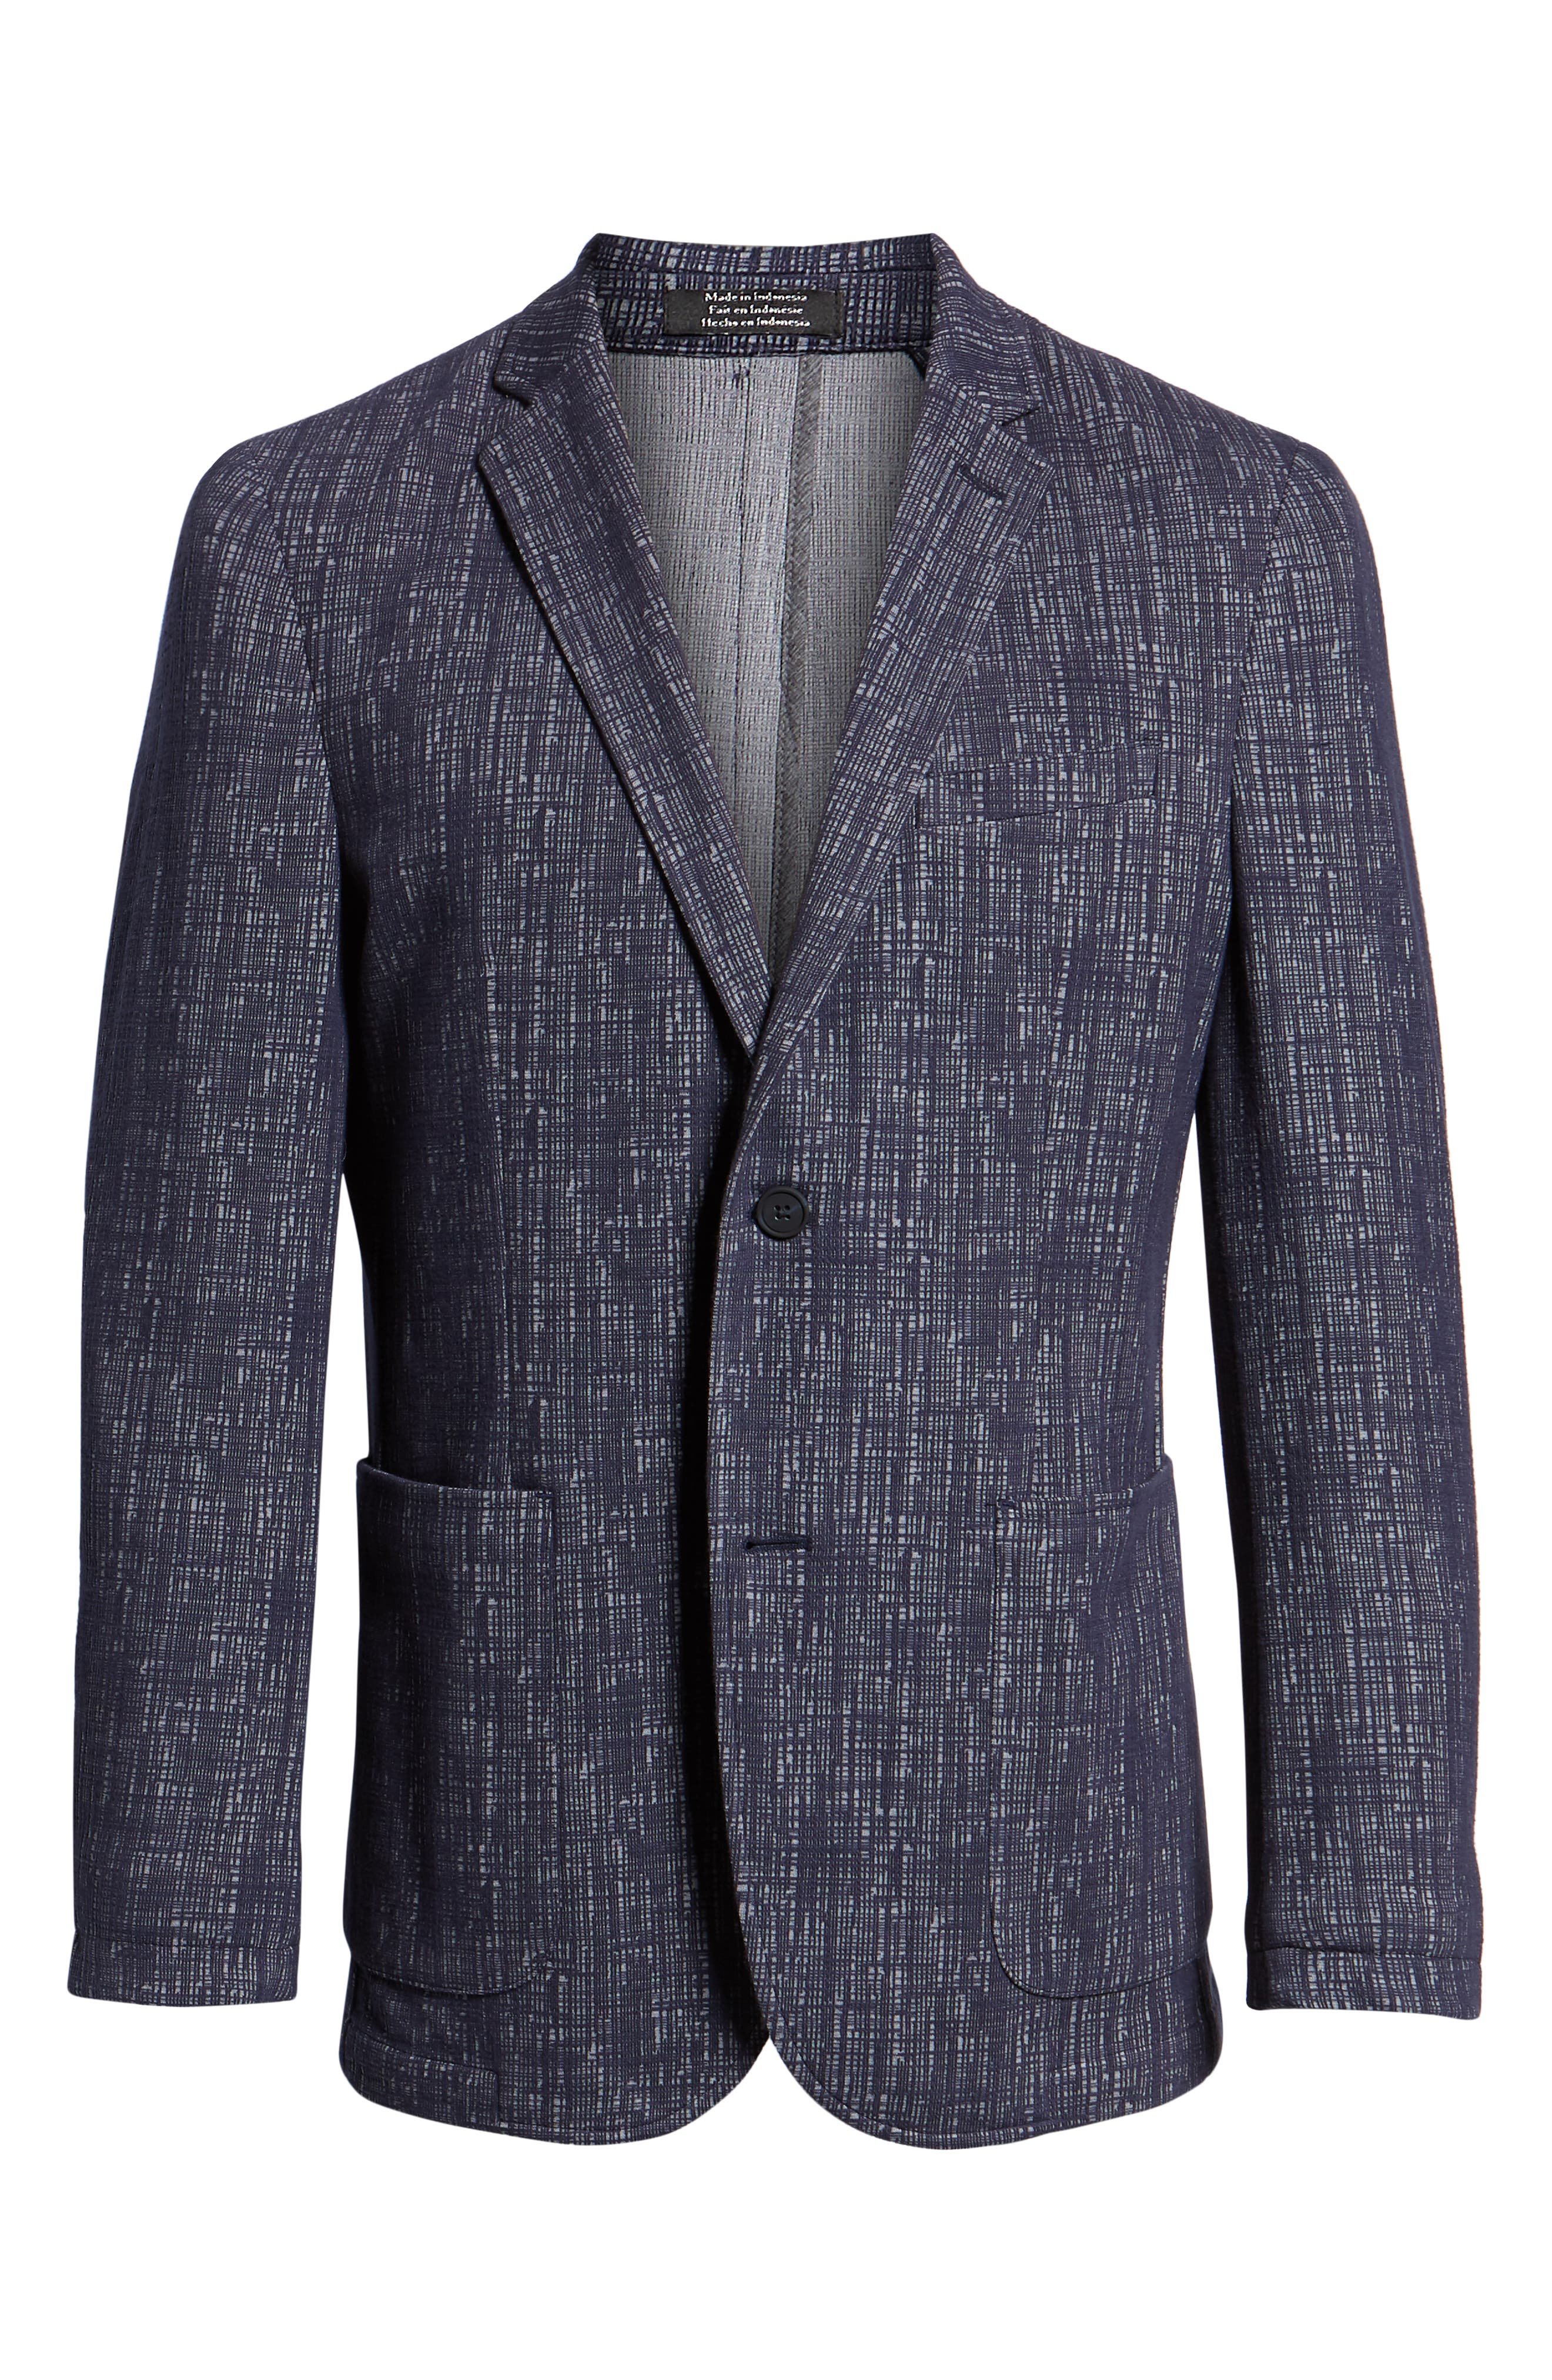 VINCE CAMUTO,                             Mesh Pattern Slim Fit Sport Coat,                             Alternate thumbnail 5, color,                             BLUE